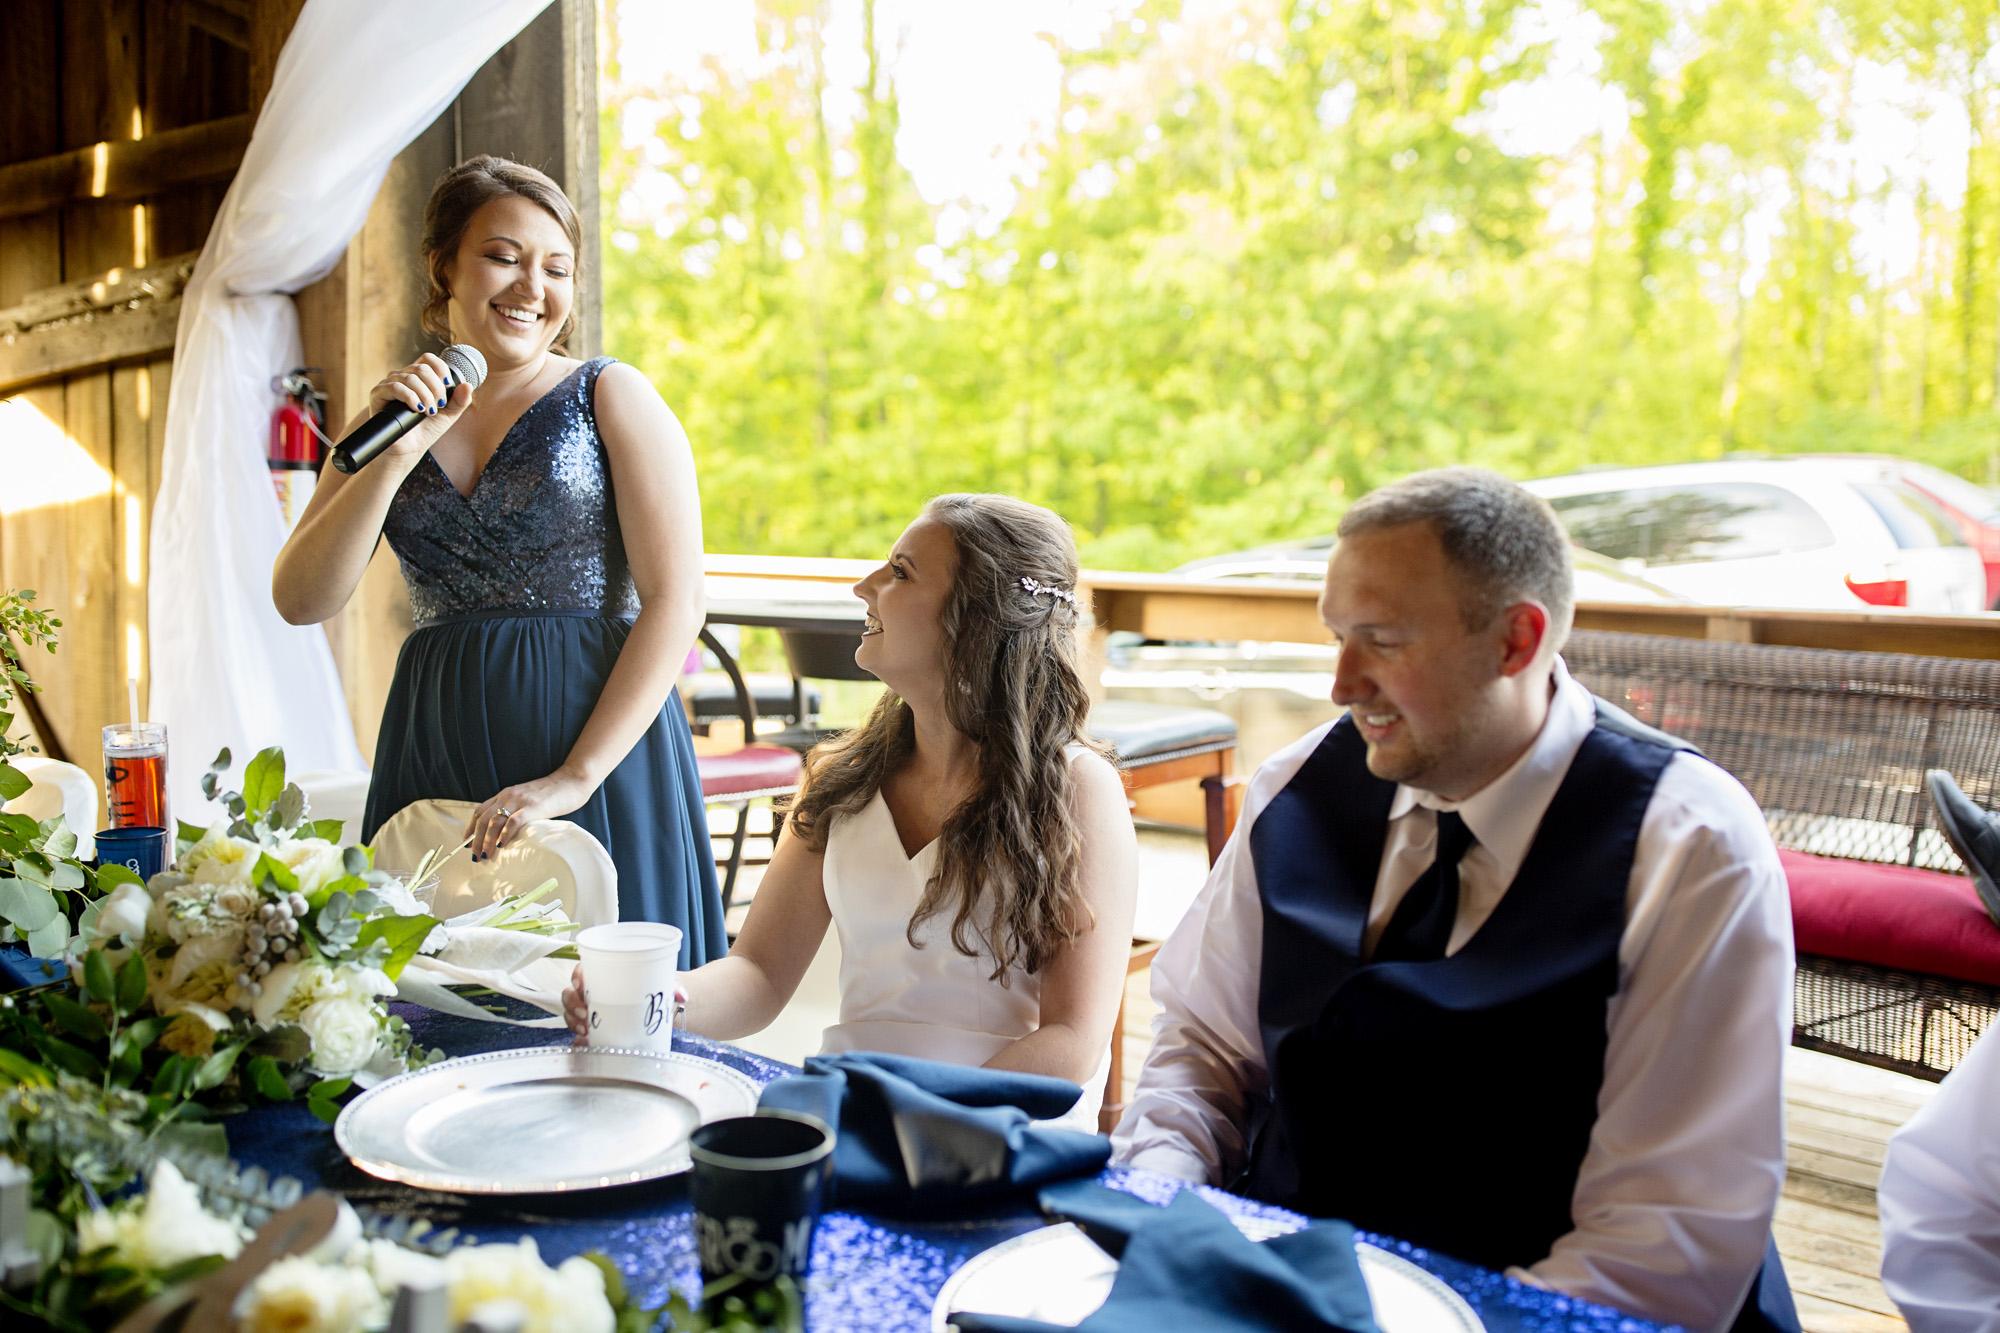 Seriously_Sabrina_Photography_Red_River_Gorge_Wedding_Barn_Robinson93.jpg